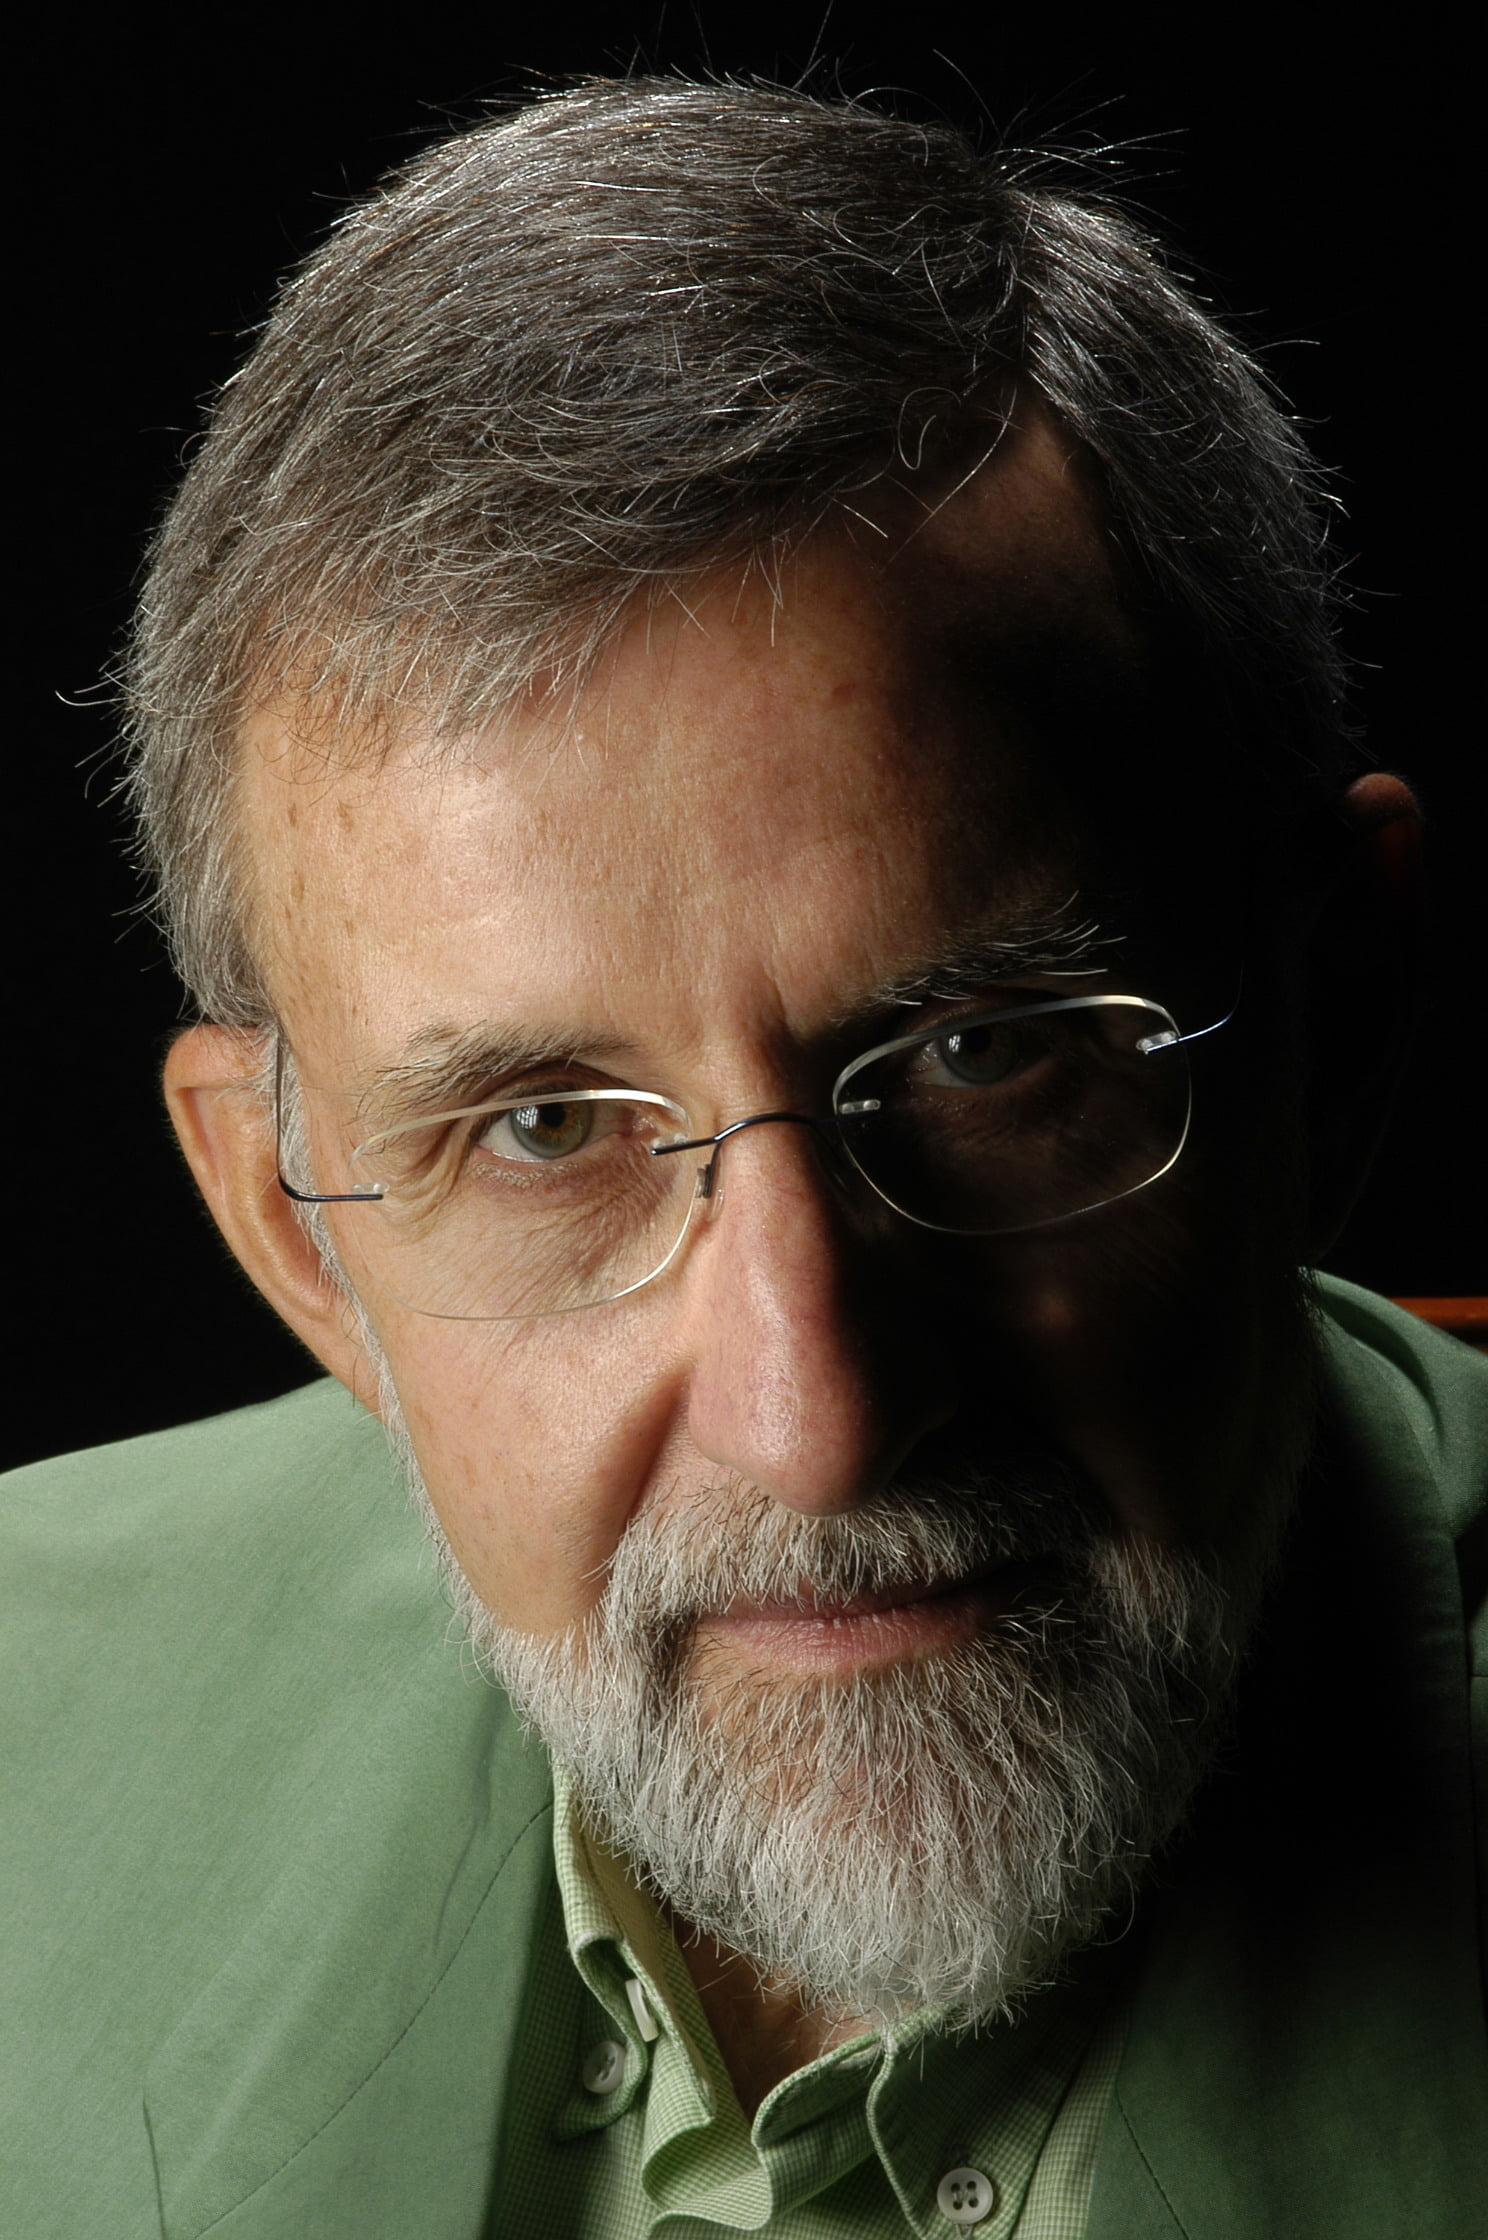 Sr. Lluís Farré Grau